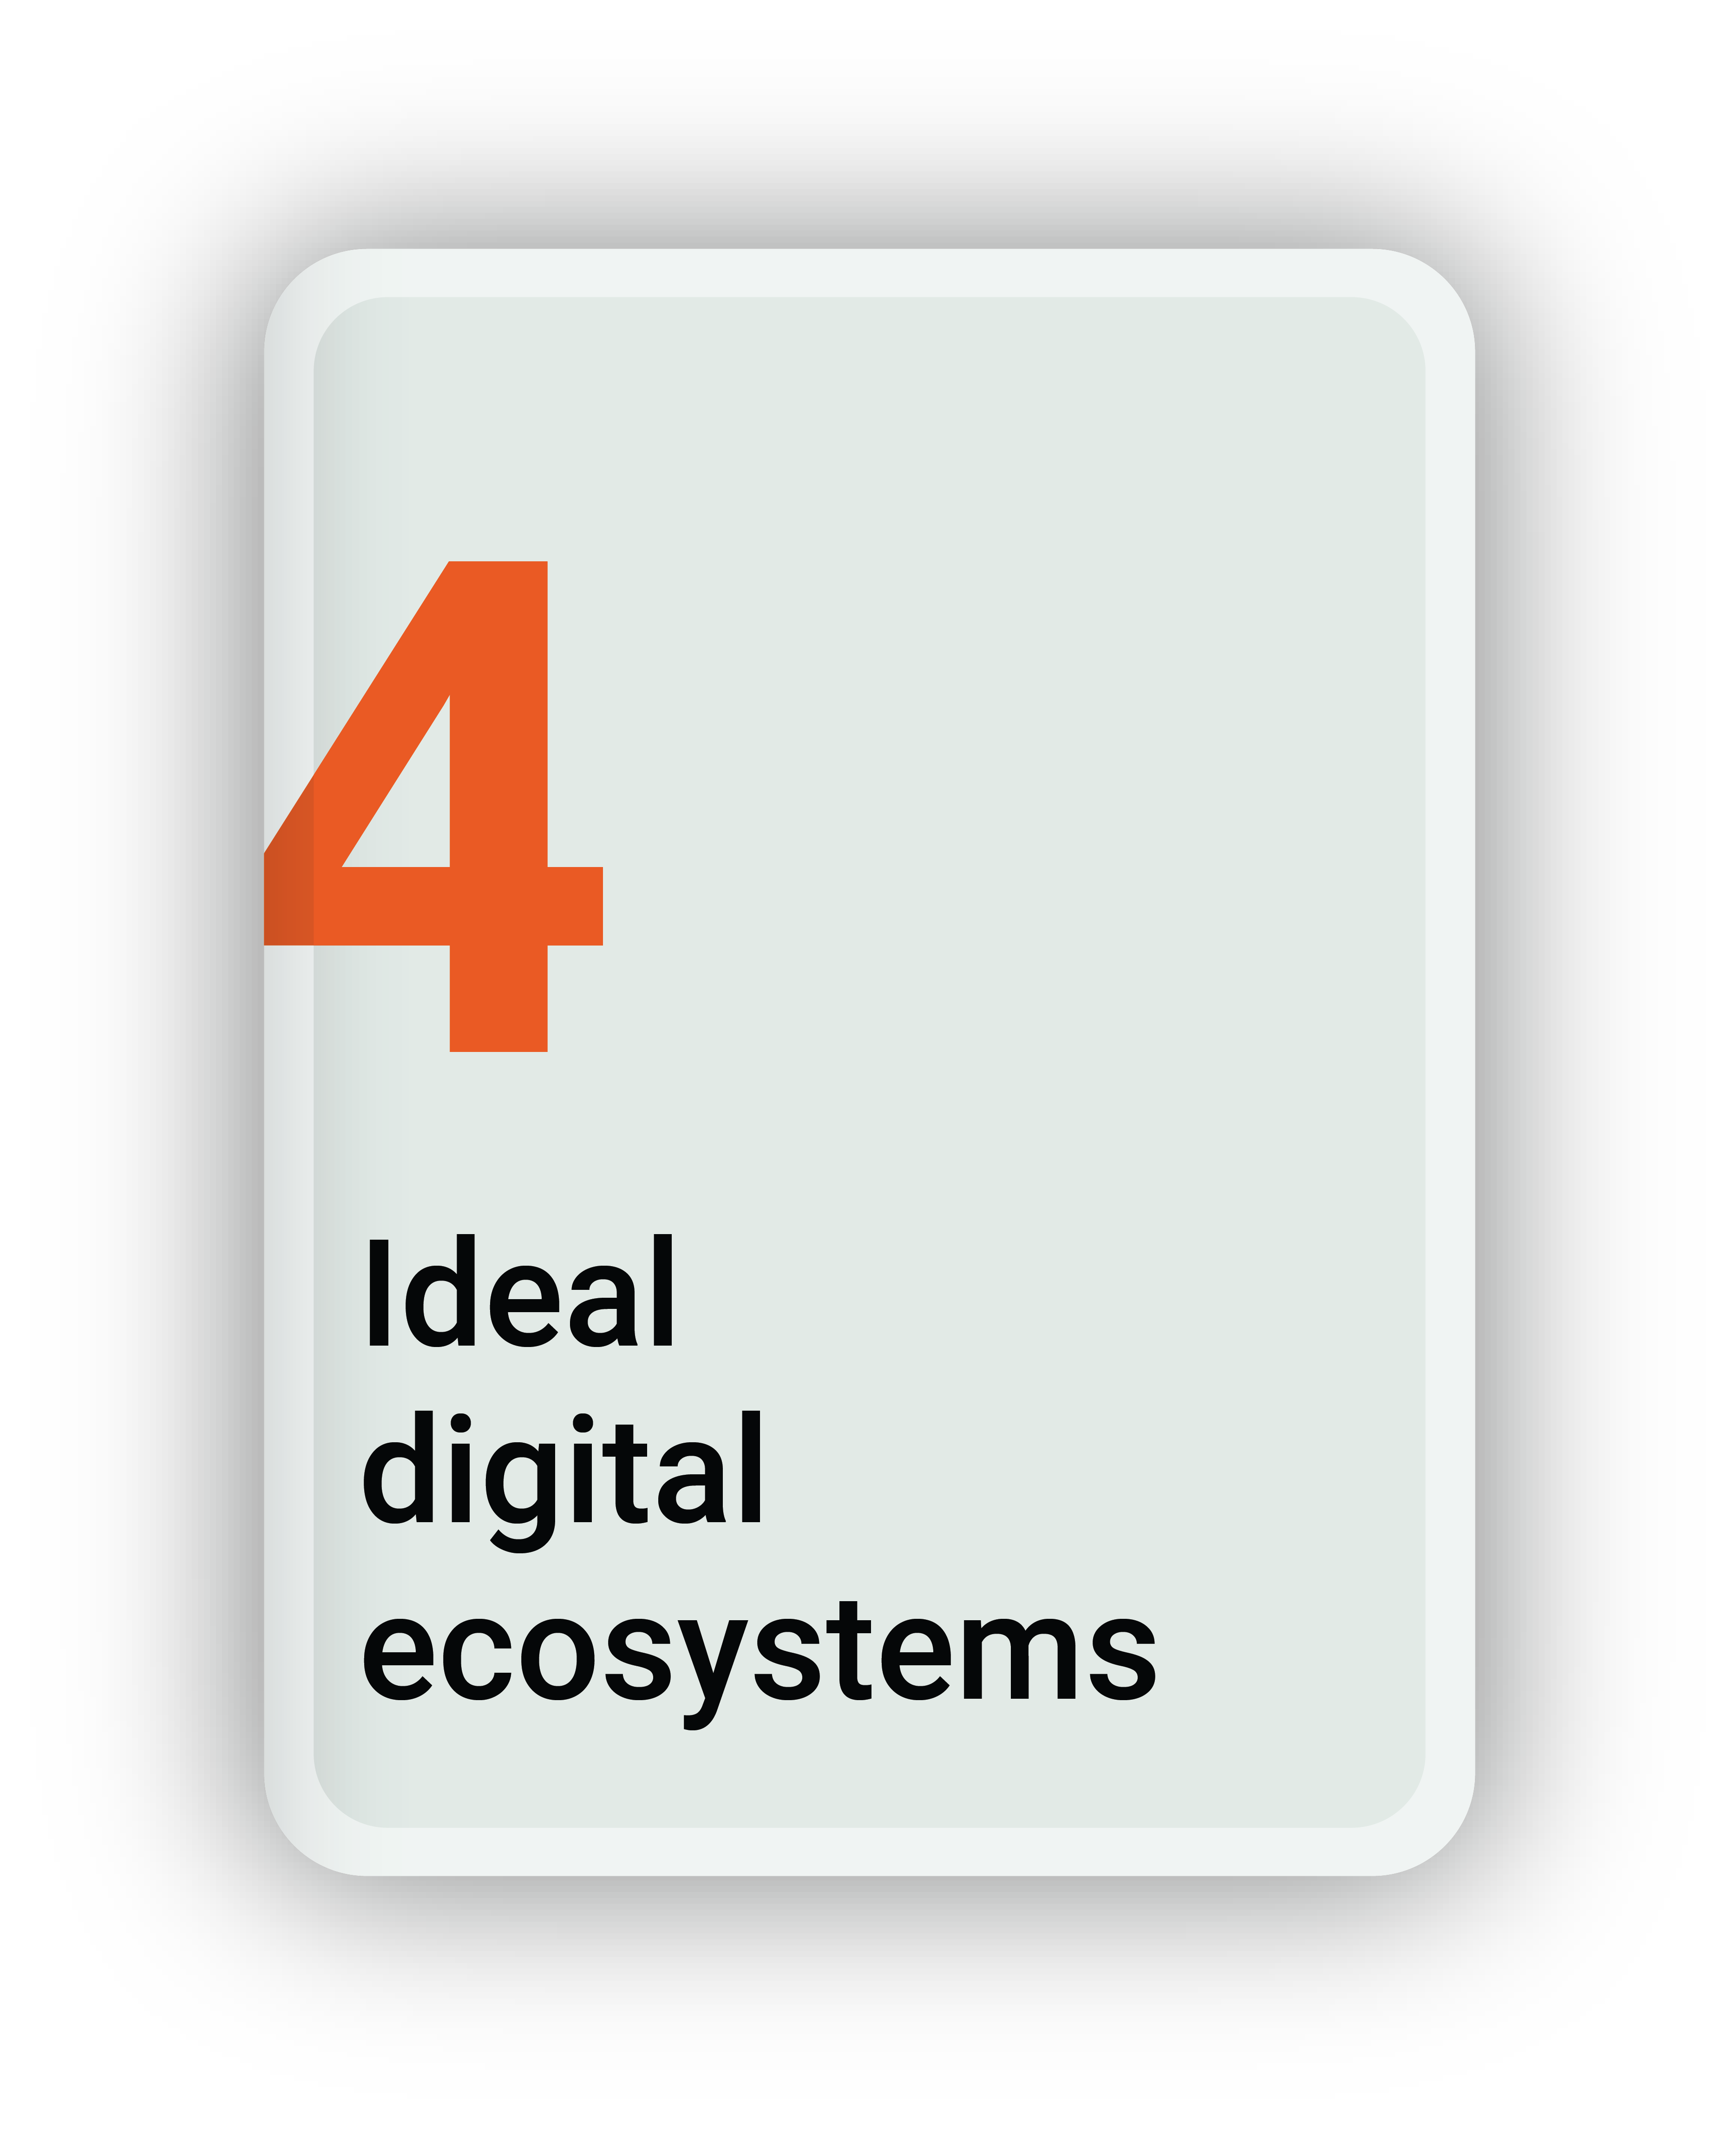 Ideal Digital Ecosystems